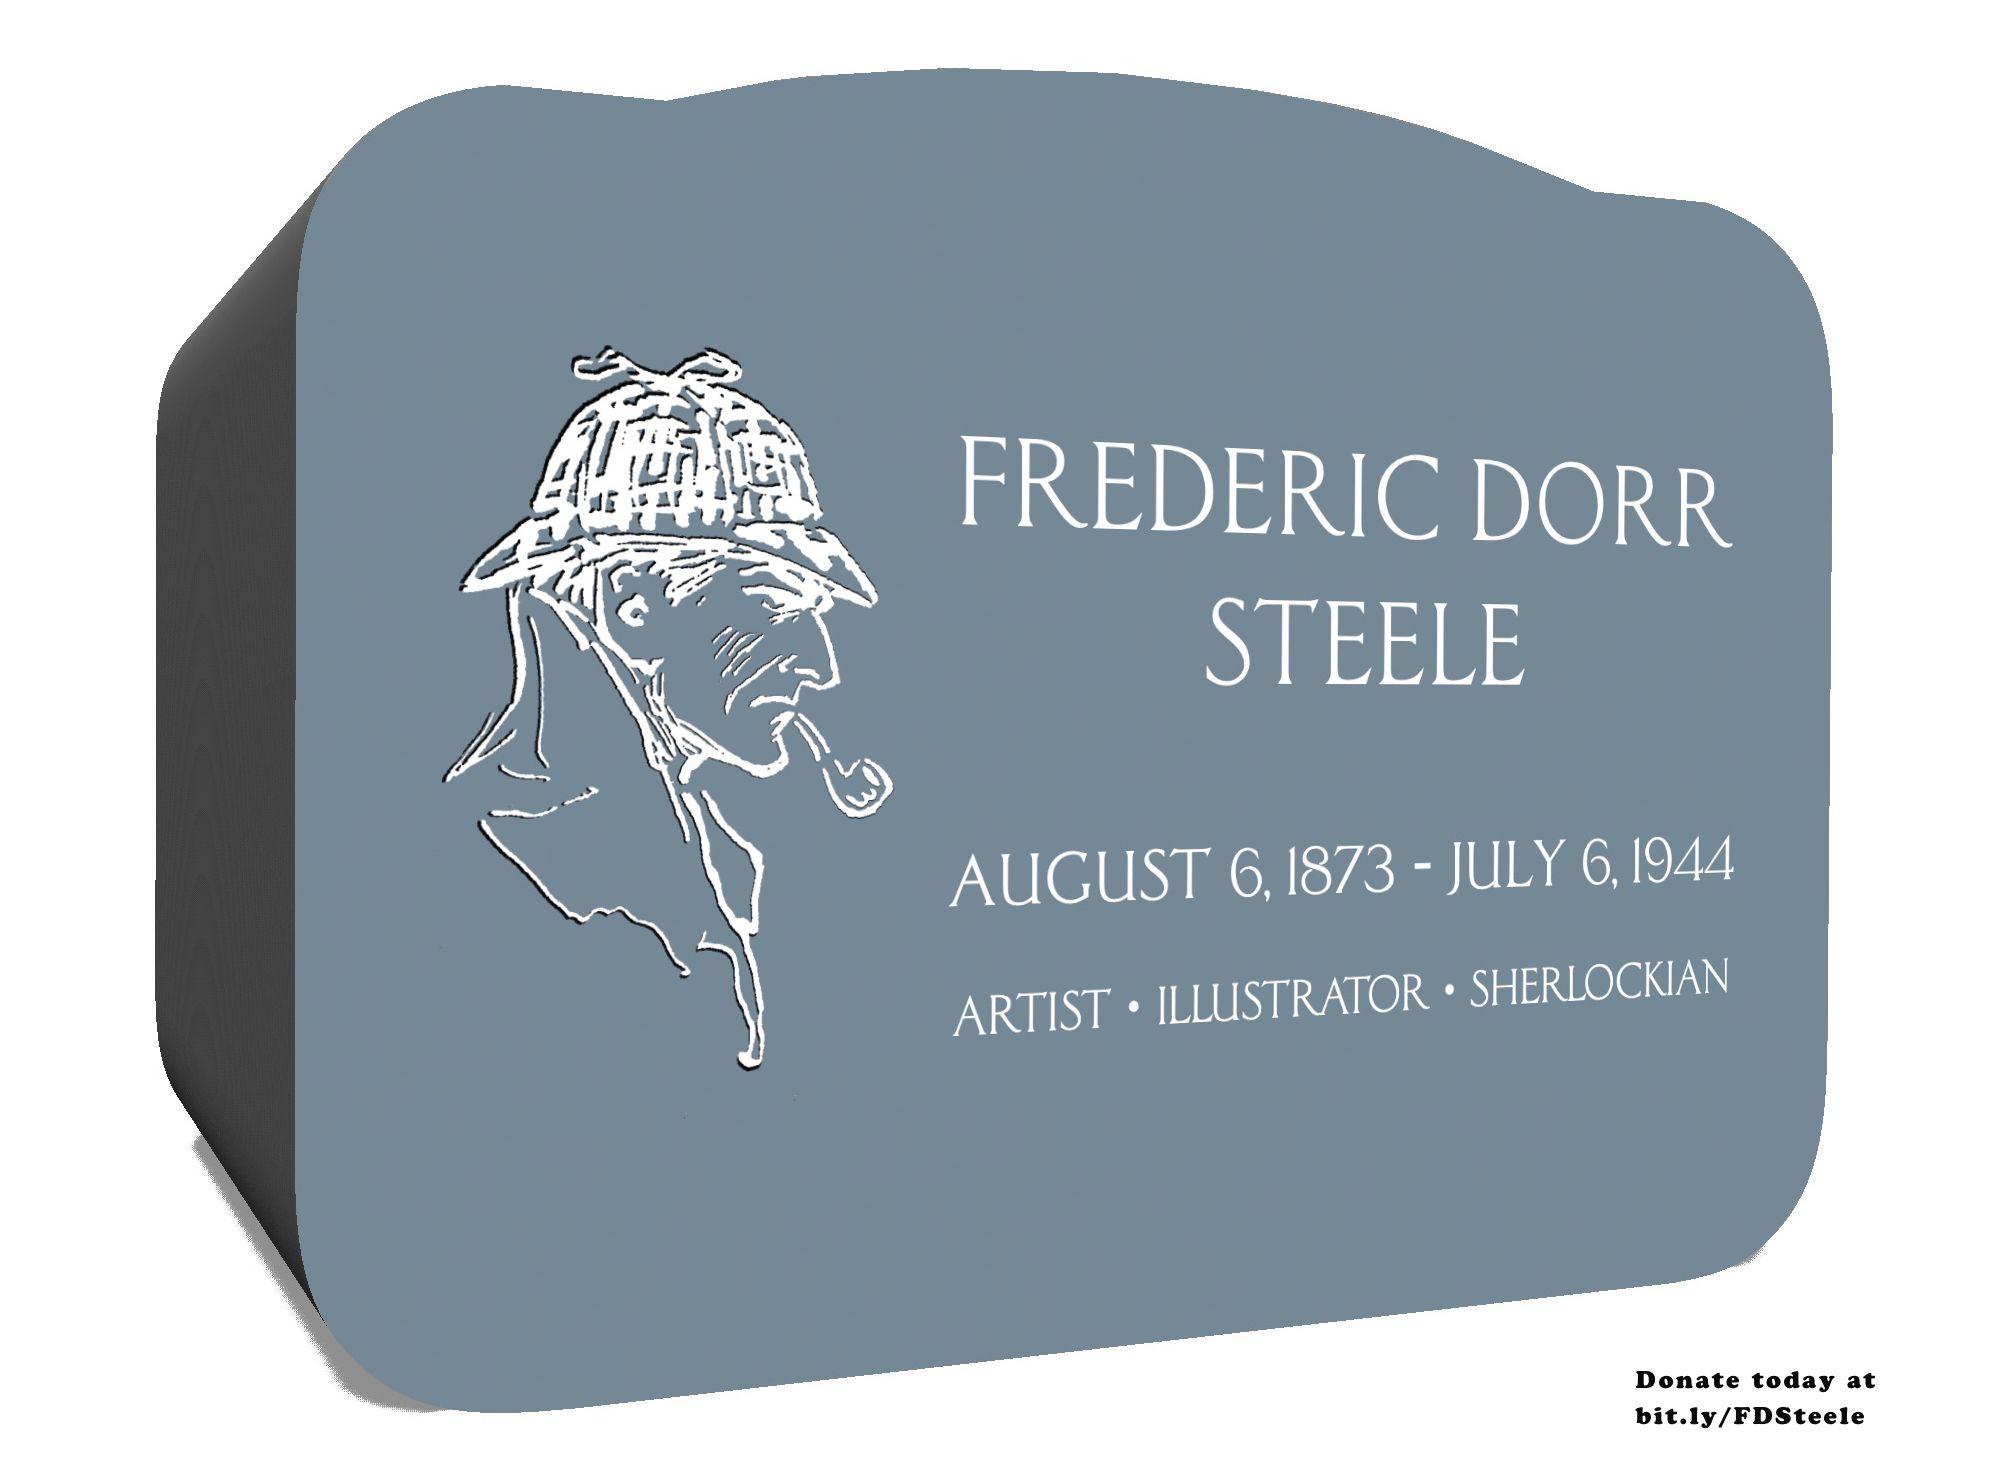 Help Erect The Frederic Dorr Steele Memorial